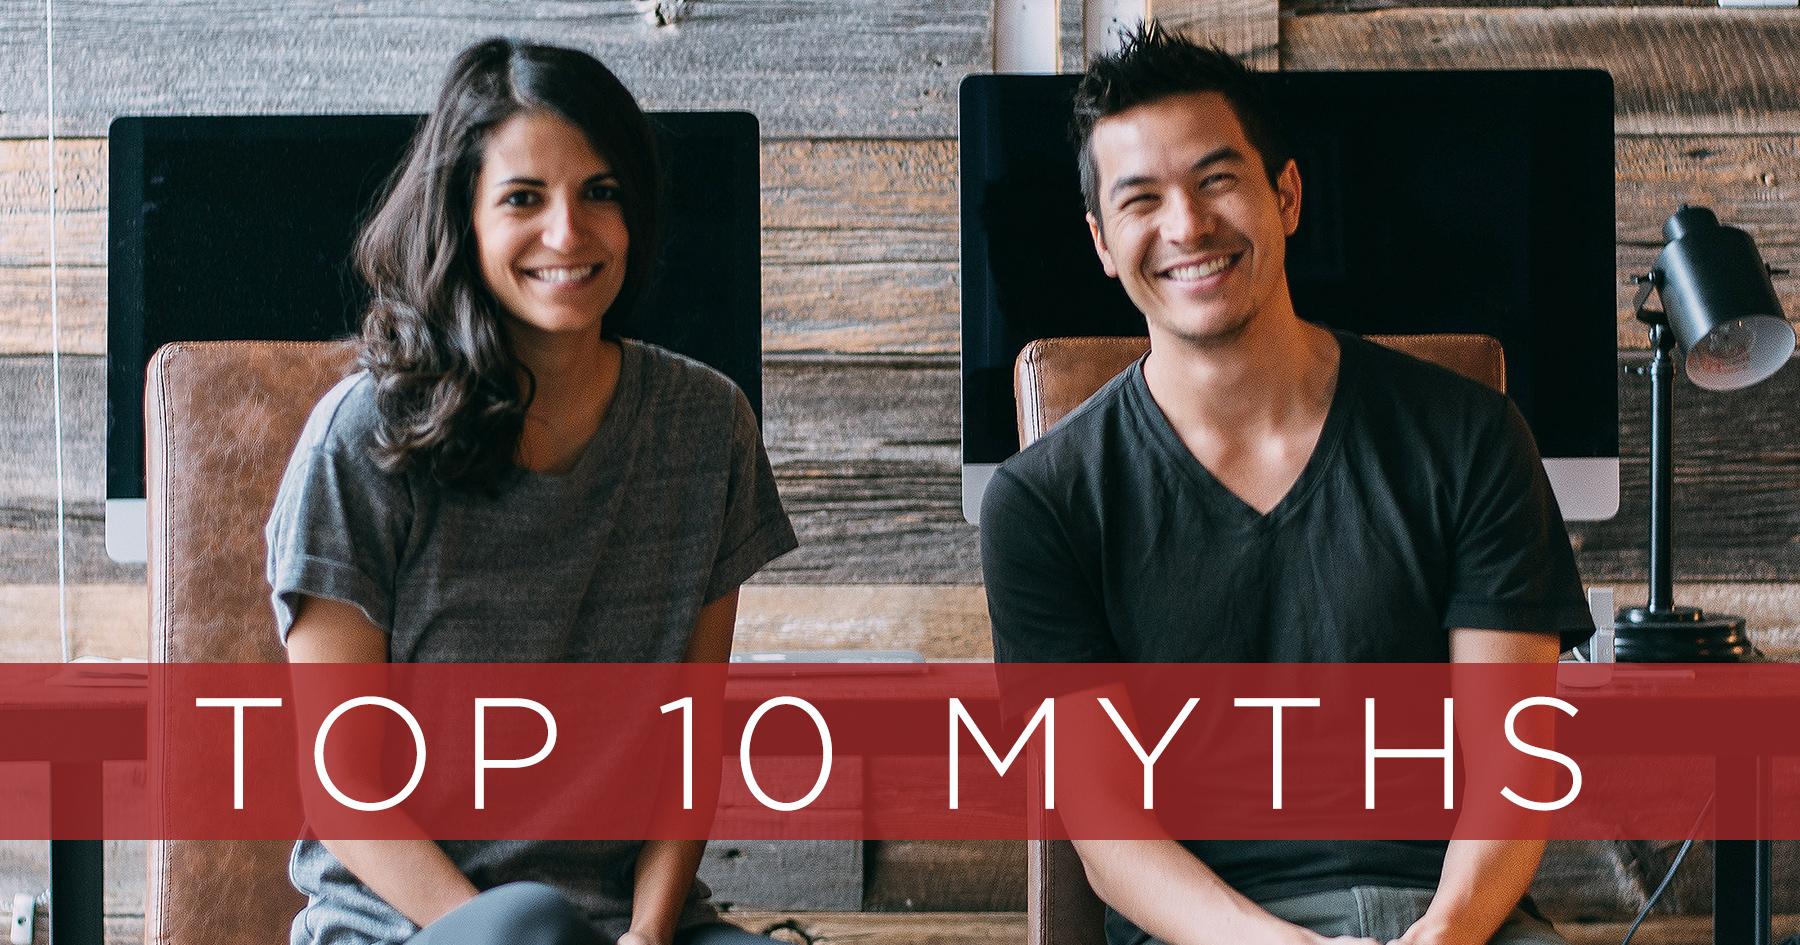 Top-10-Myths-Facebook